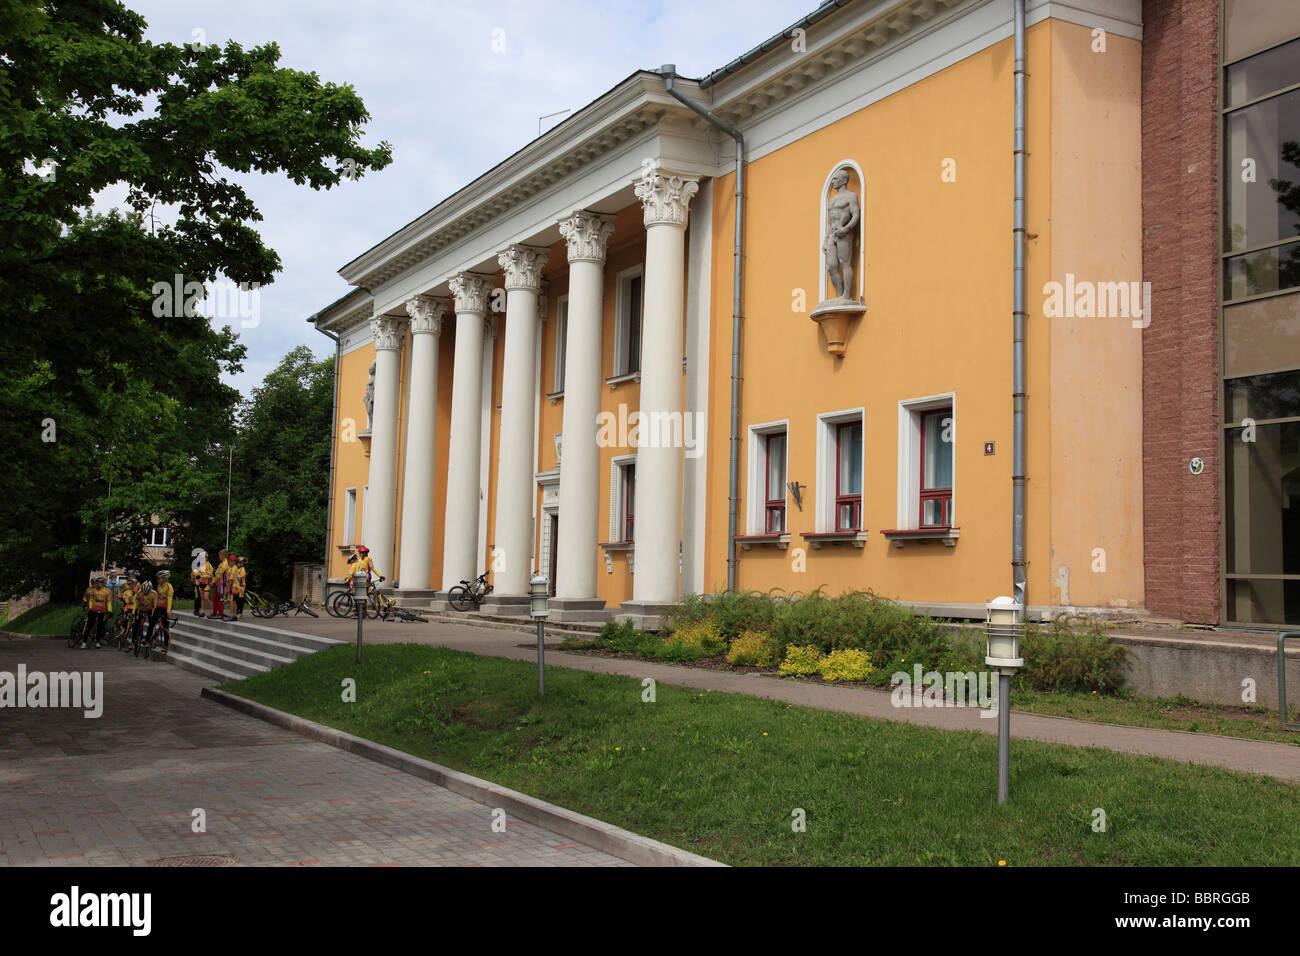 down town of Viljandi, Estonia, Baltic Nation, Eastern Europe.  Photo by Willy Matheisl - Stock Image